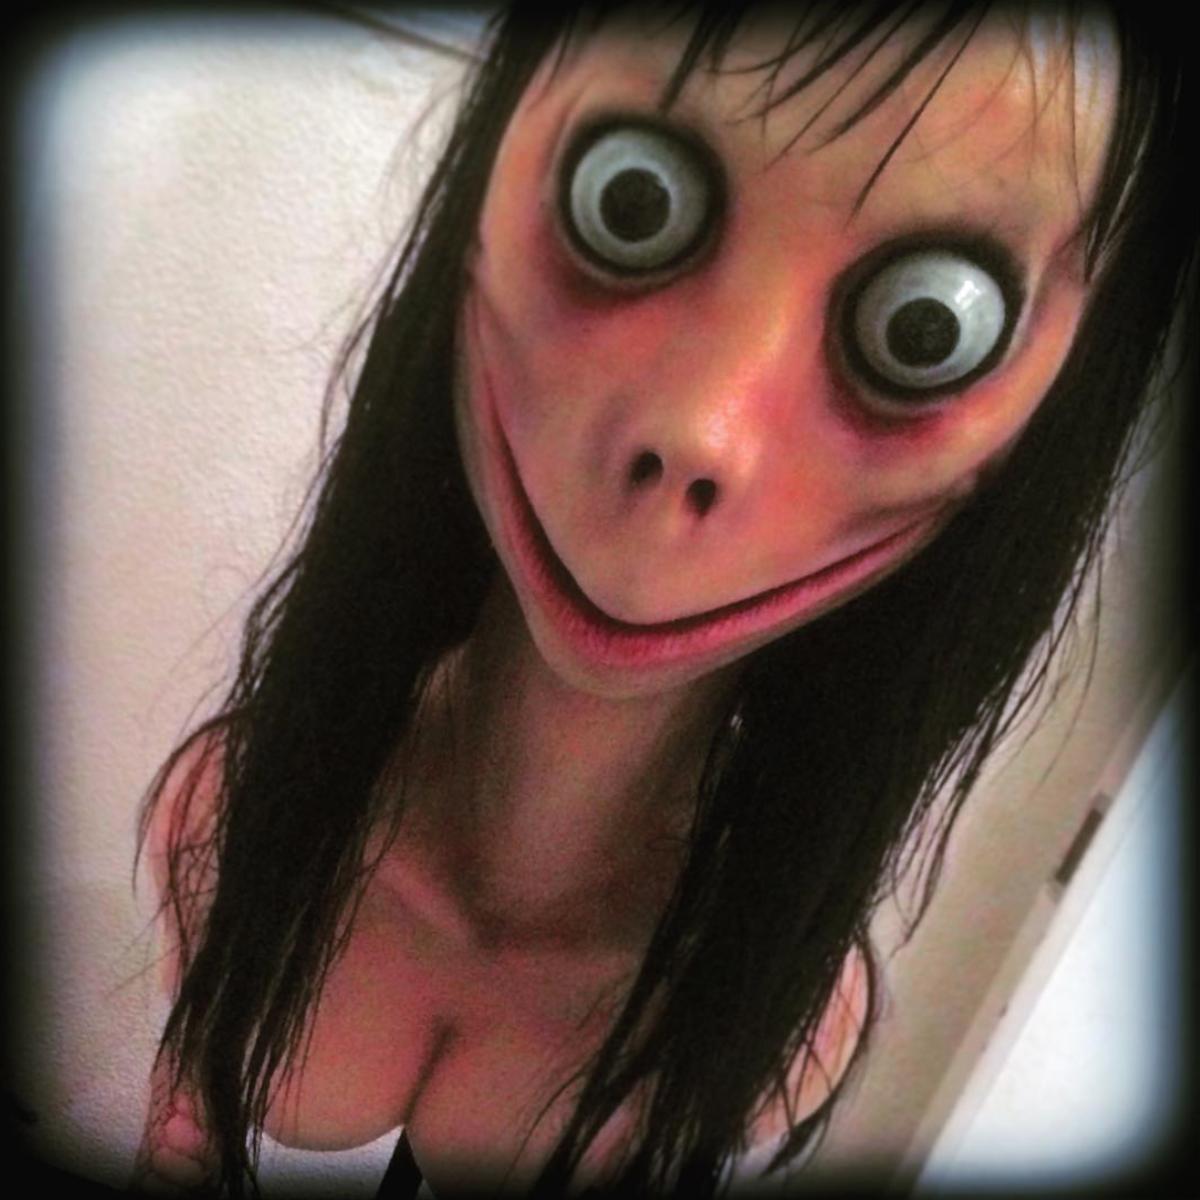 Smile Creepy Viral: Creepy Momo Messaging Craze Linked To Girl's Death